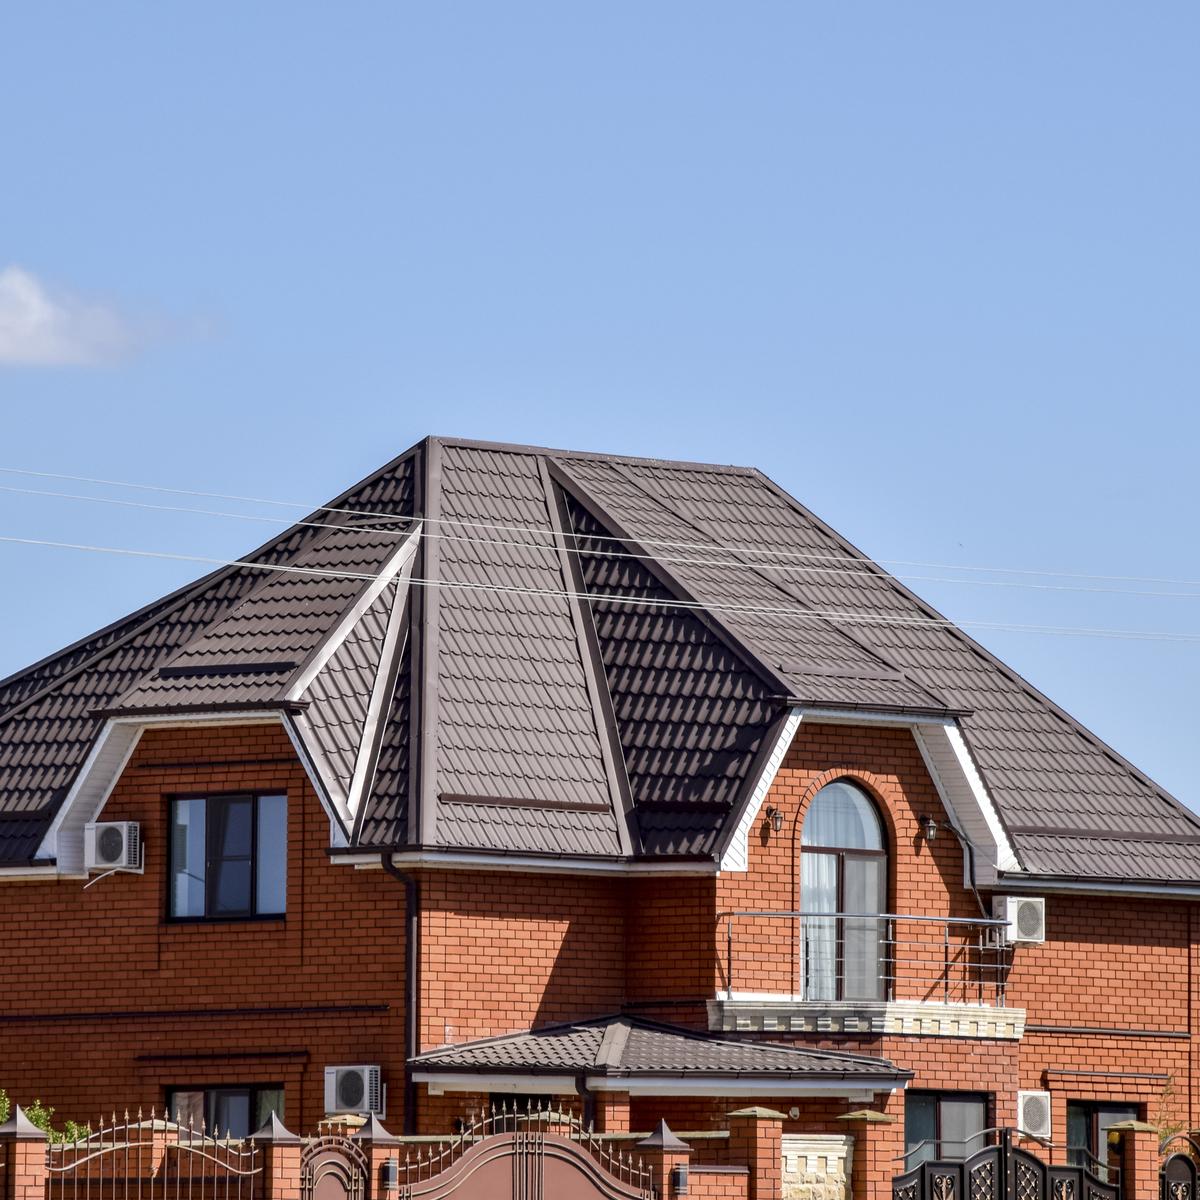 Metal roof on residential building